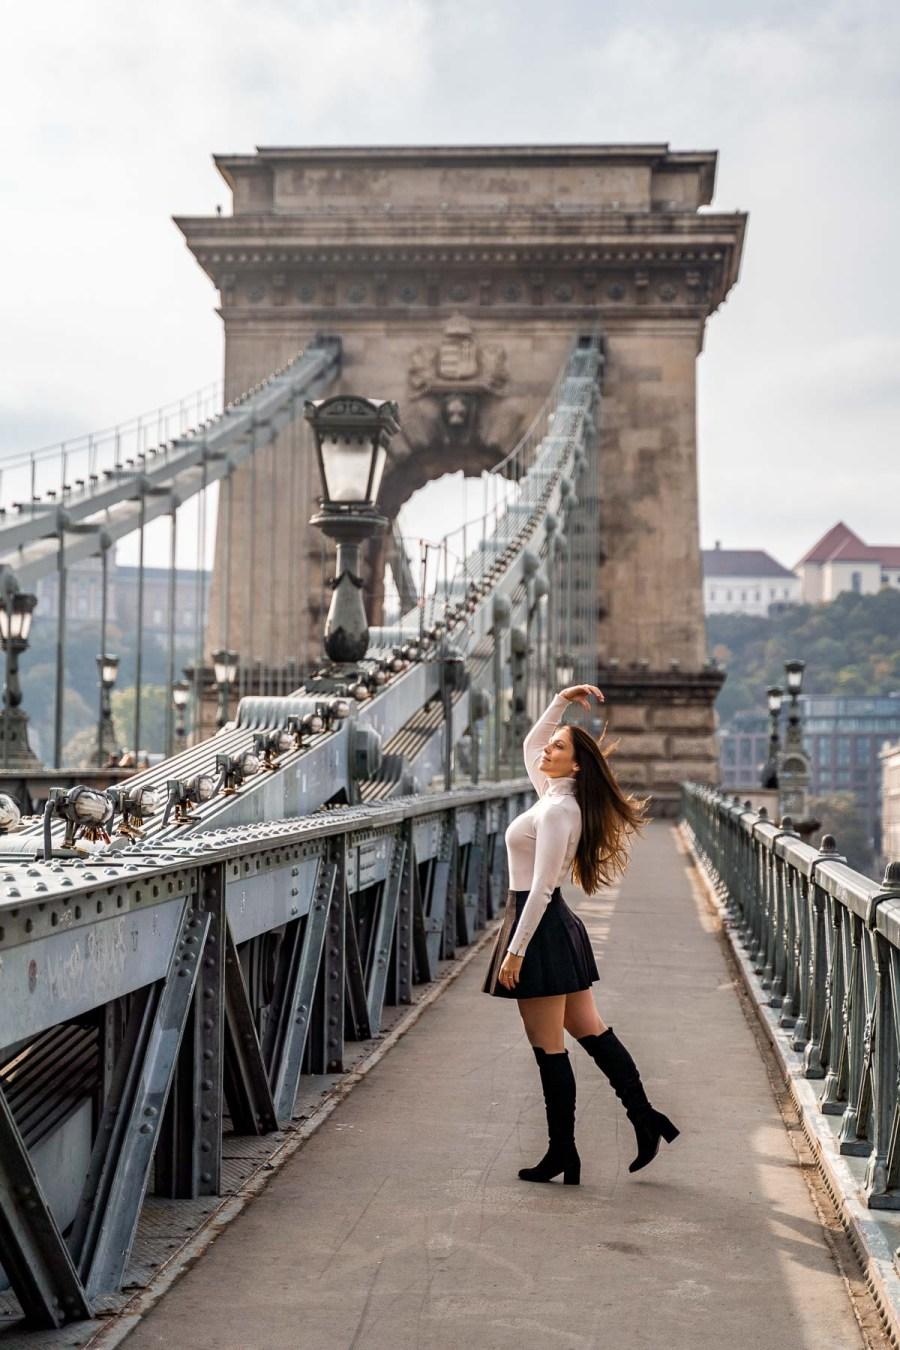 Girl standing on the Szechenyi Chain Bridge in Budapest